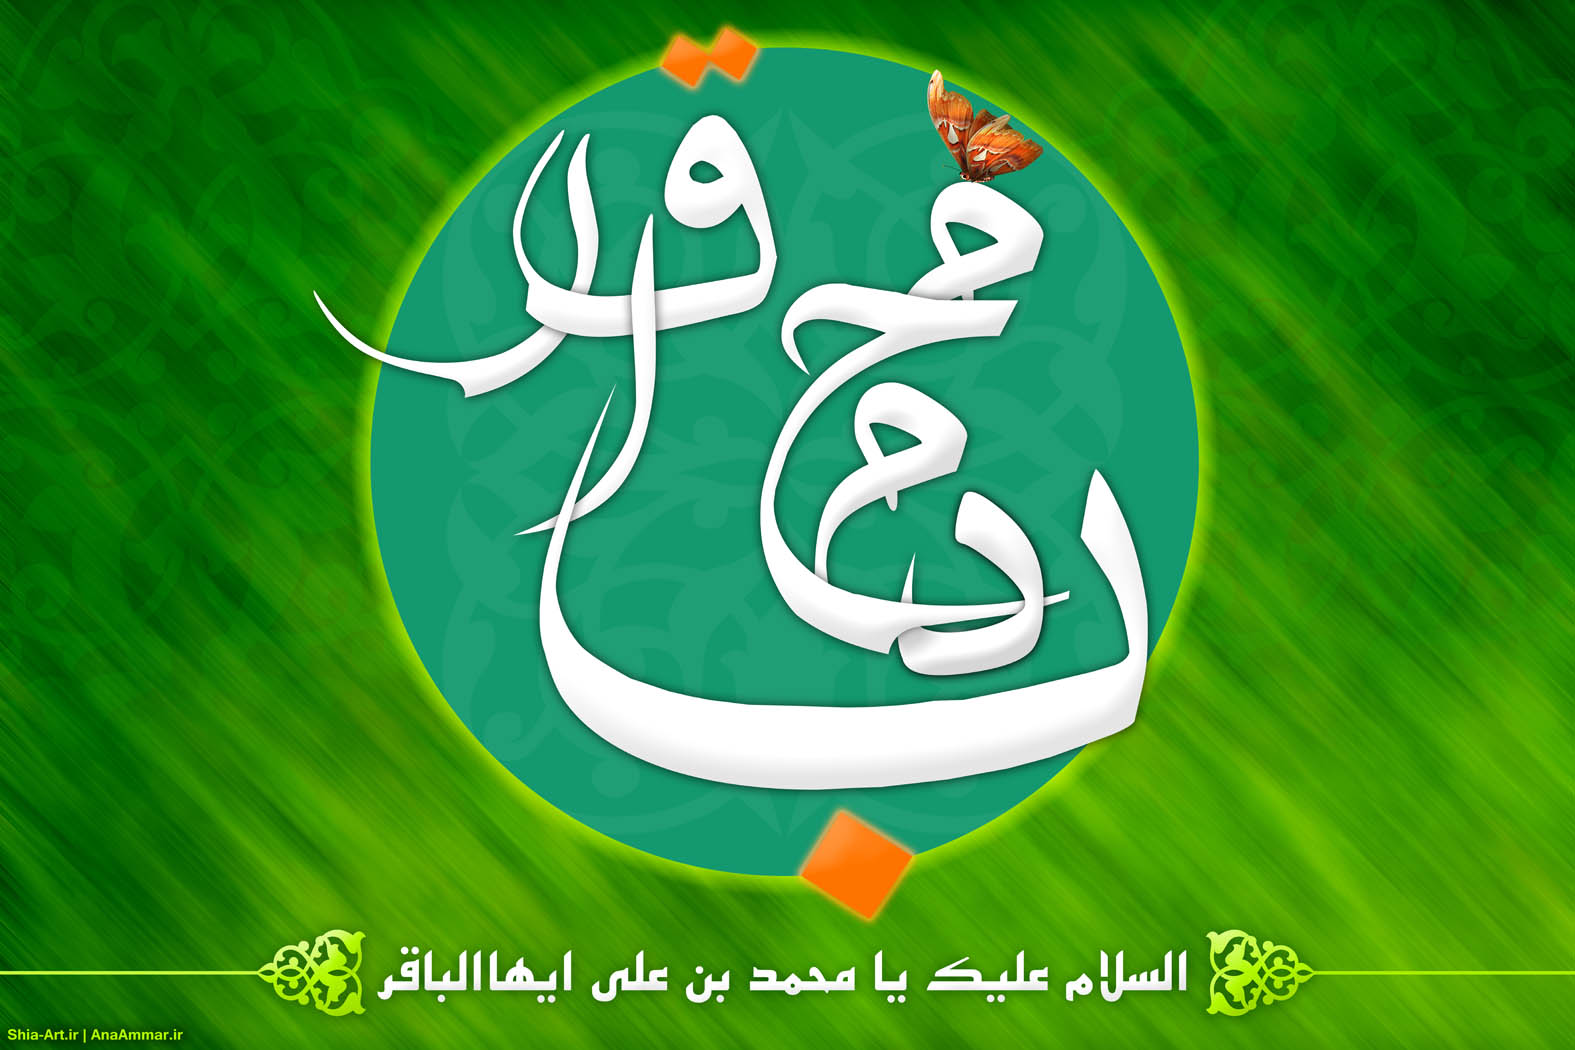 بنر و پوستر ولادت امام محمد باقر (ع)